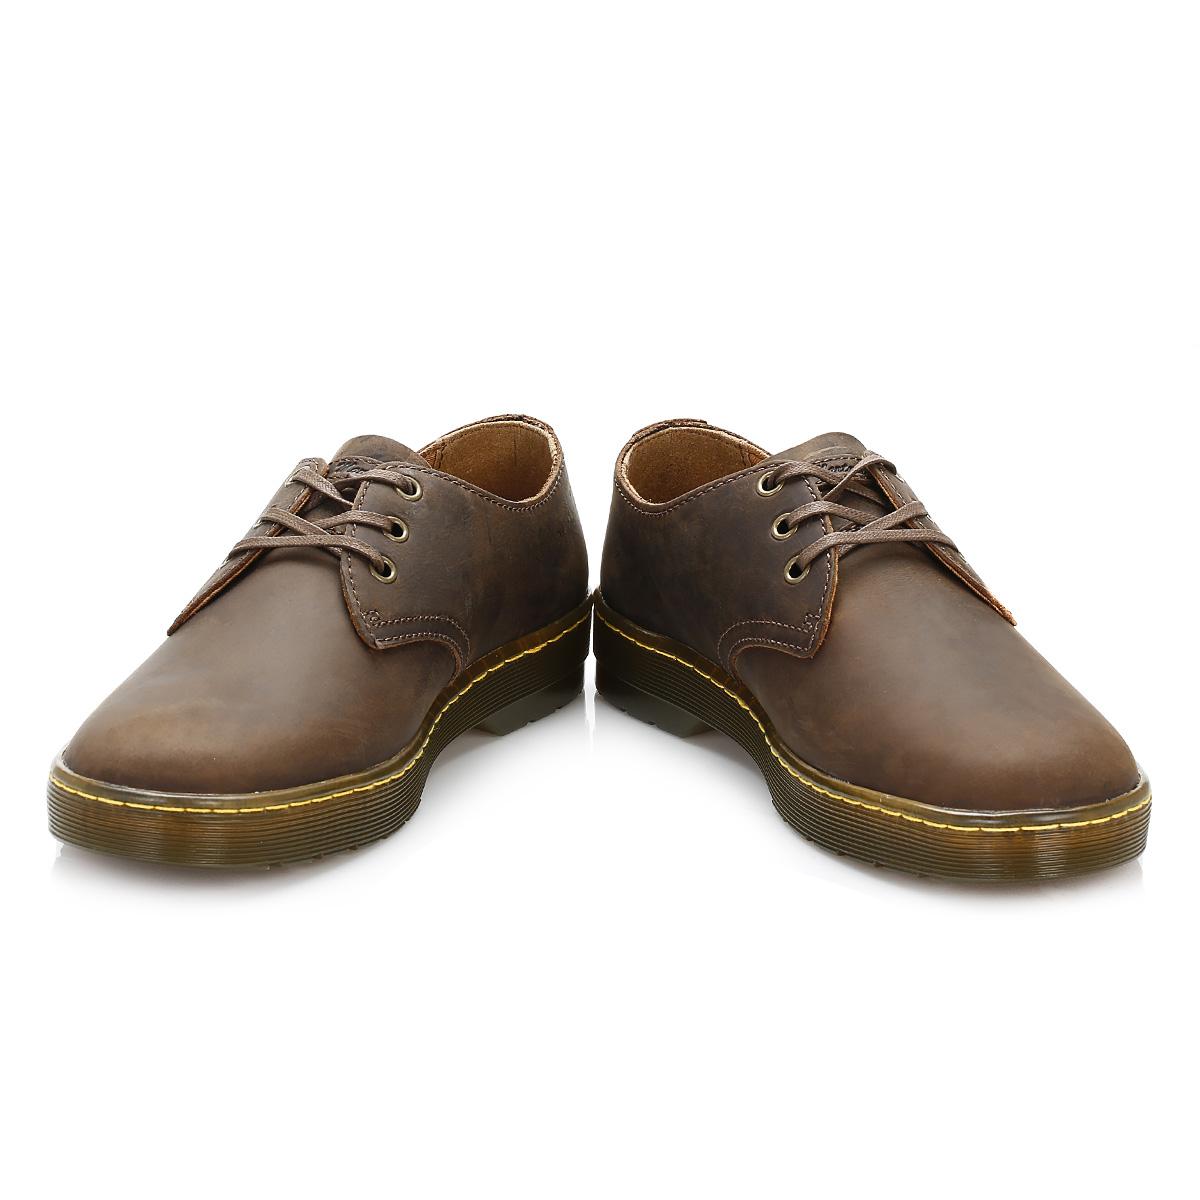 102dc744c7177f Dr. Martens Mens Brown Leather Derby Shoes, Lace Up Smart Casual Docs